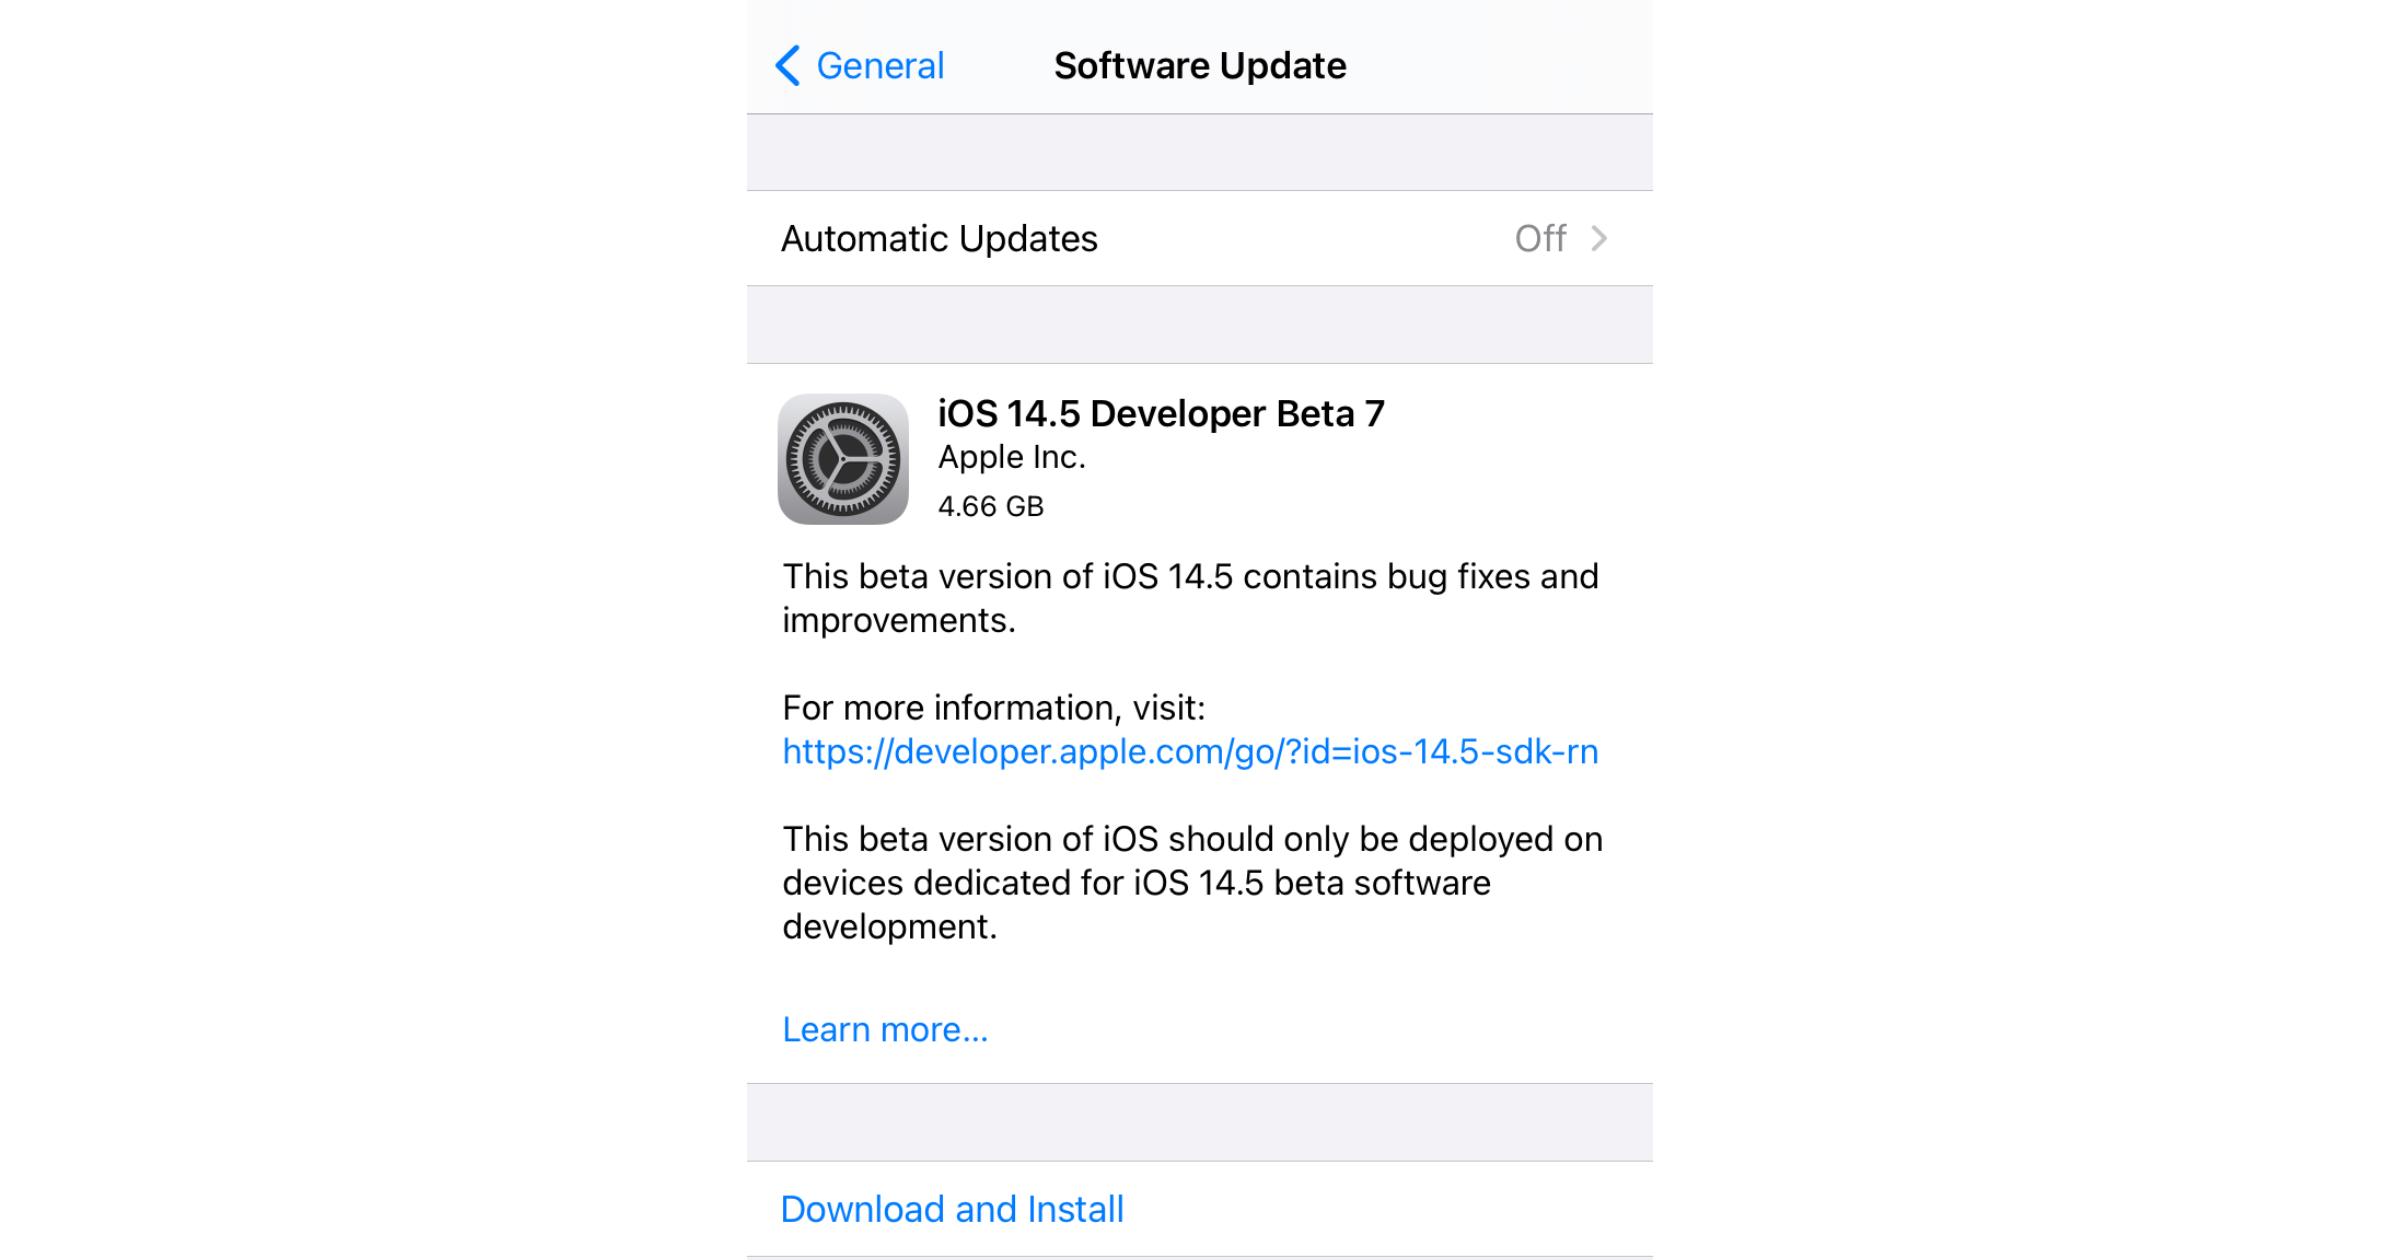 iOS 14.5 dev beta 7